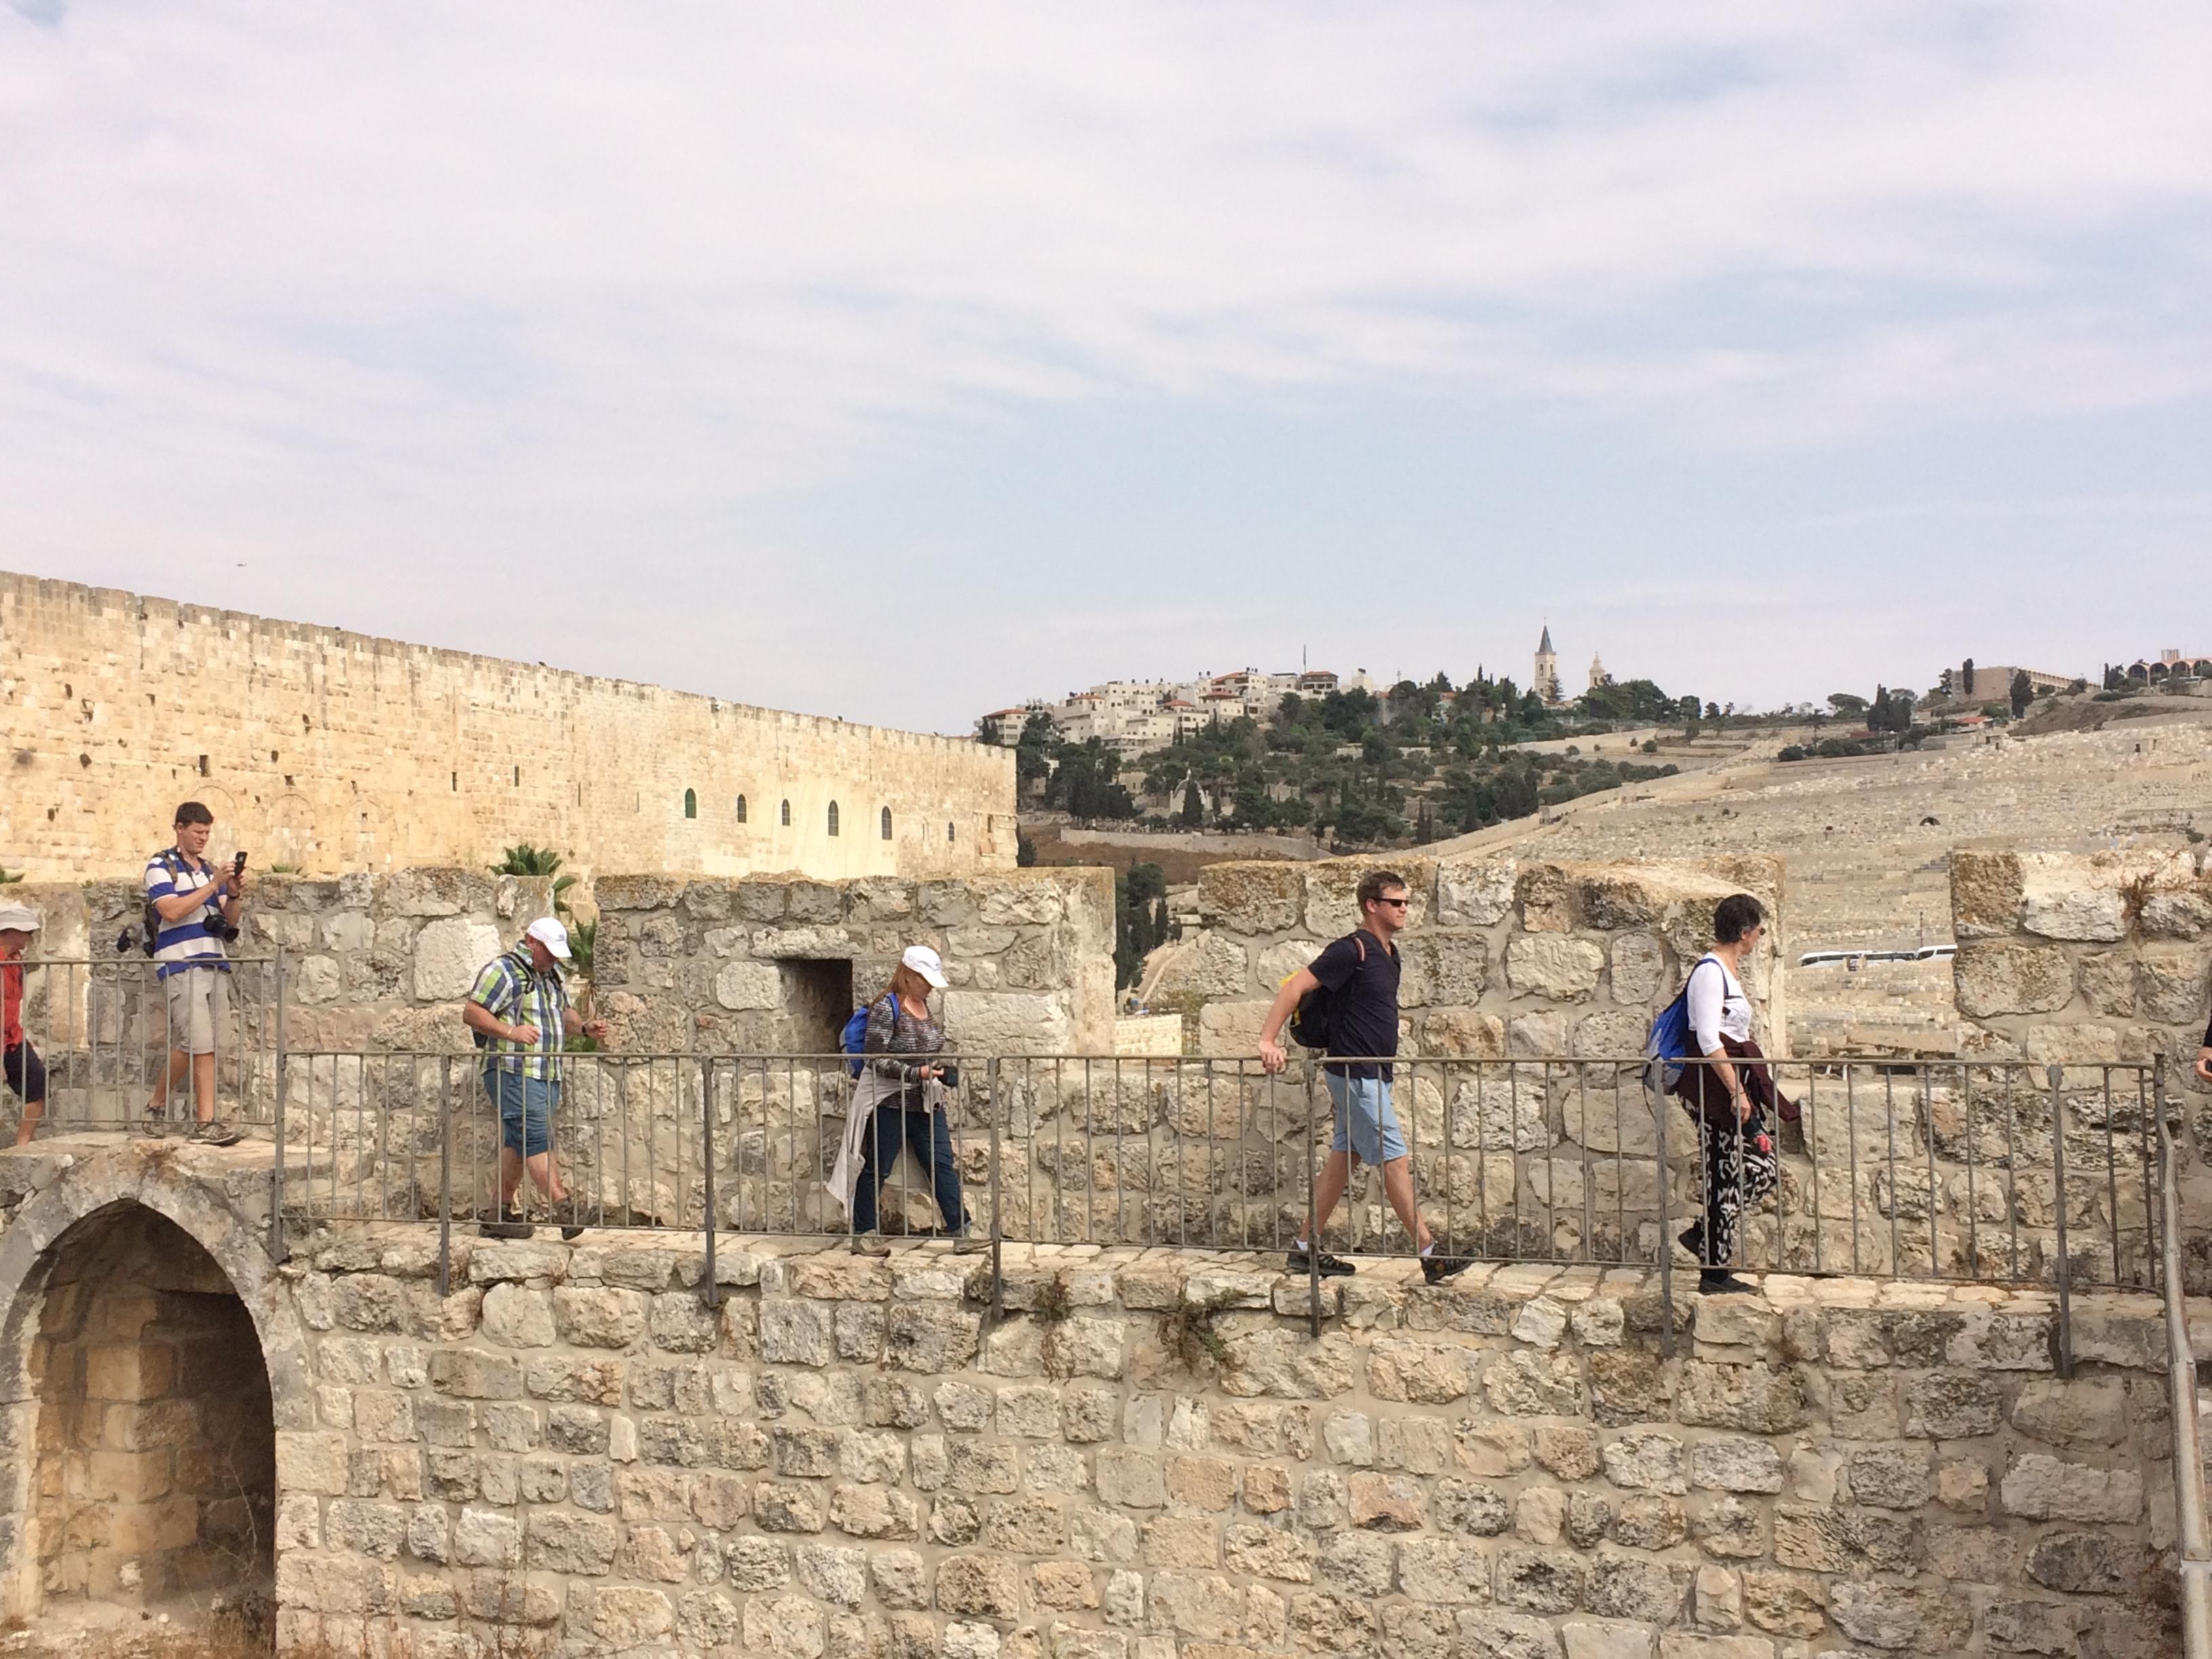 Walking the city walls